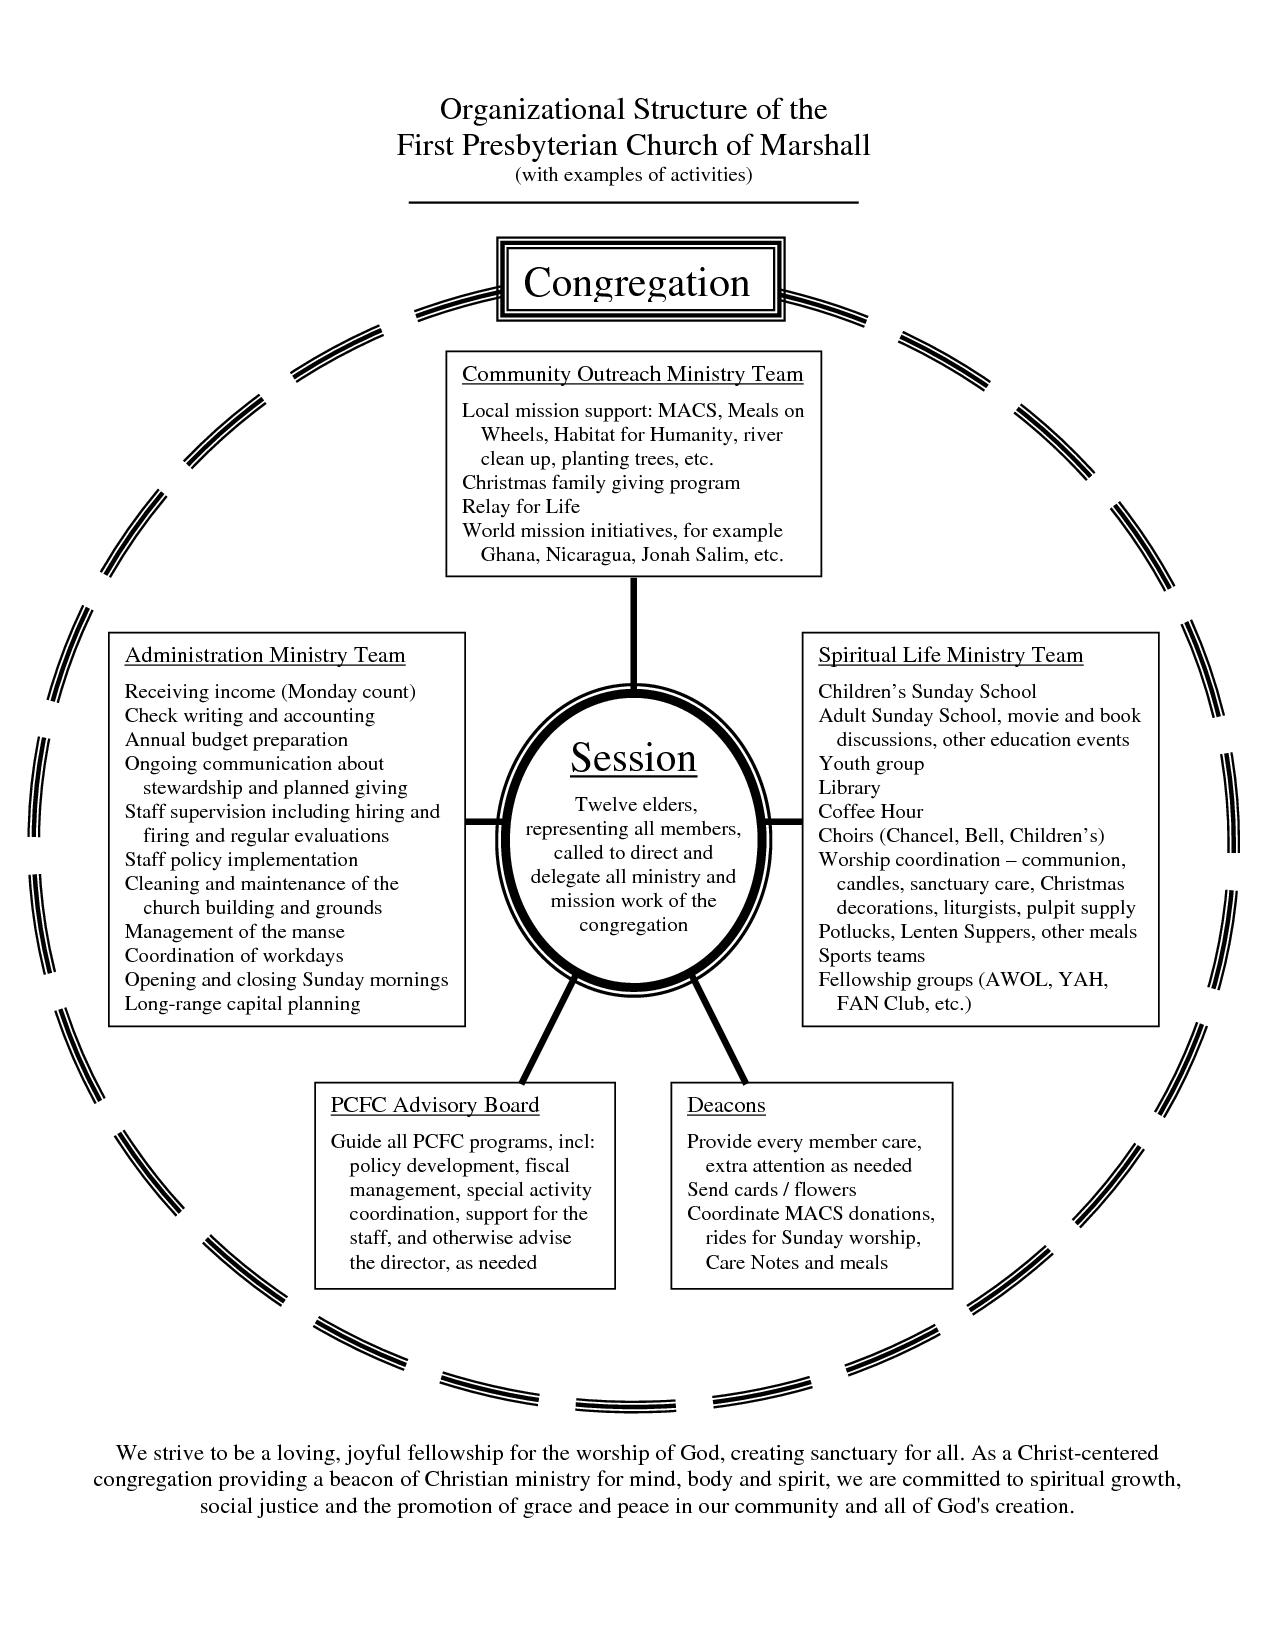 Presbyterian church organizational chart structure of the first marshall also rh pinterest